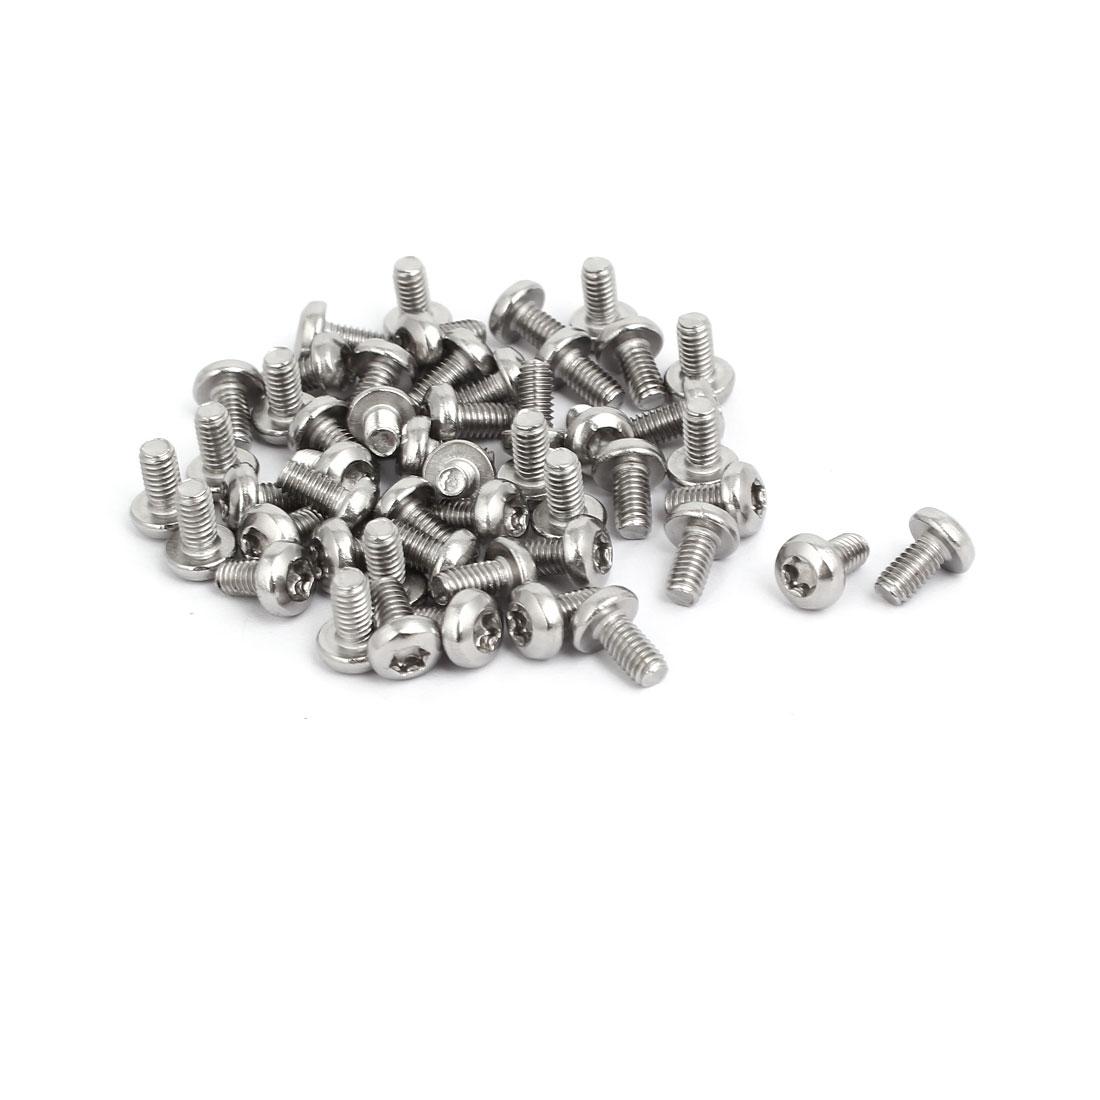 M4x8mm 304 Stainless Steel Button Head Torx Screws Bolts T10 Drive 50pcs